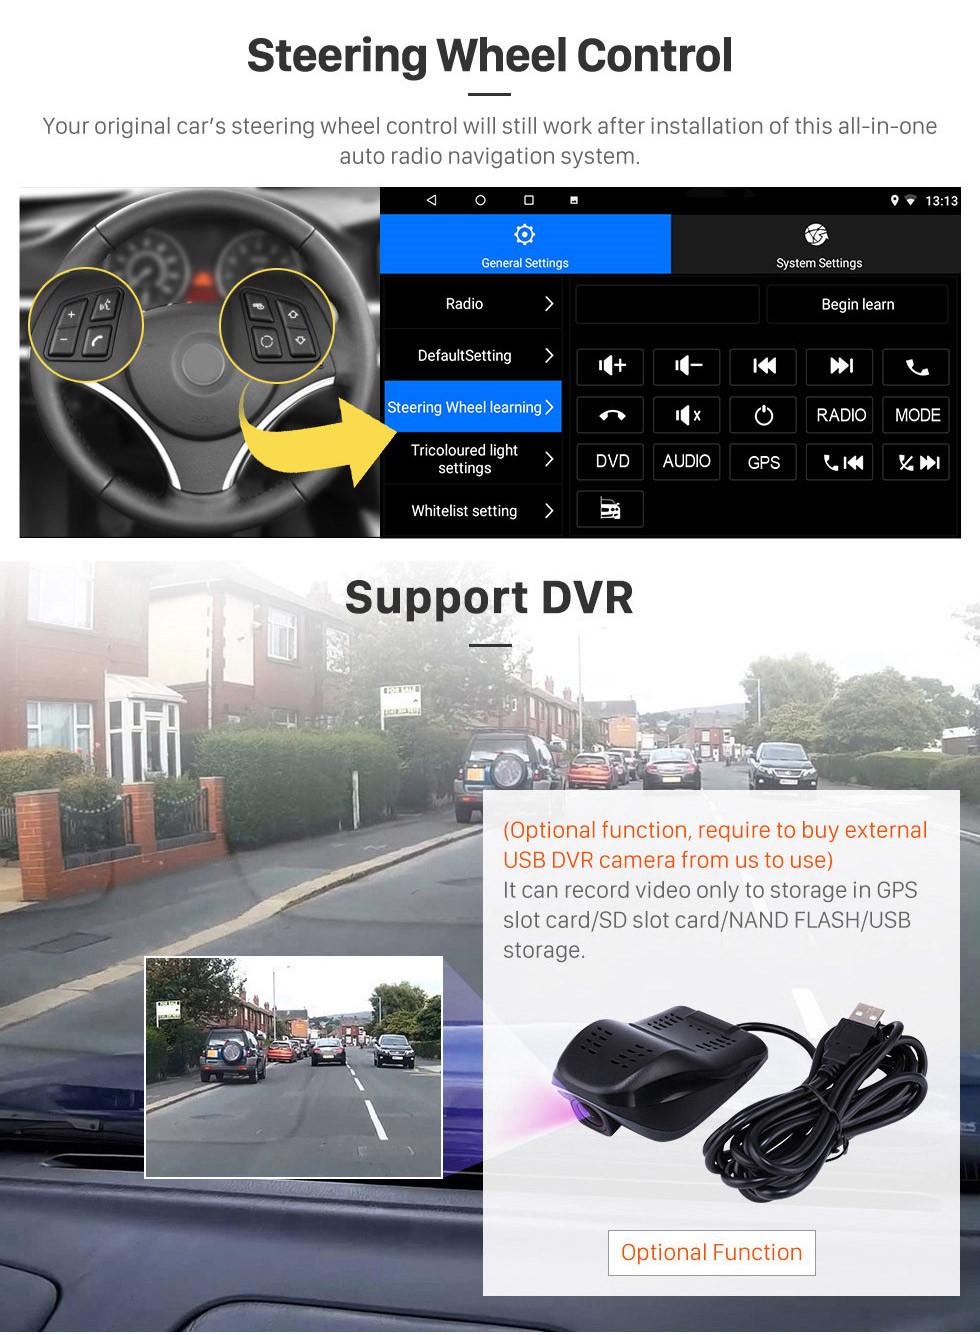 Seicane Pantalla táctil HD 9 pulgadas Android 10.0 Radio de navegación GPS para 2011-2016 MG3 con Bluetooth AUX WIFI compatible Carplay TPMS DAB + OBD